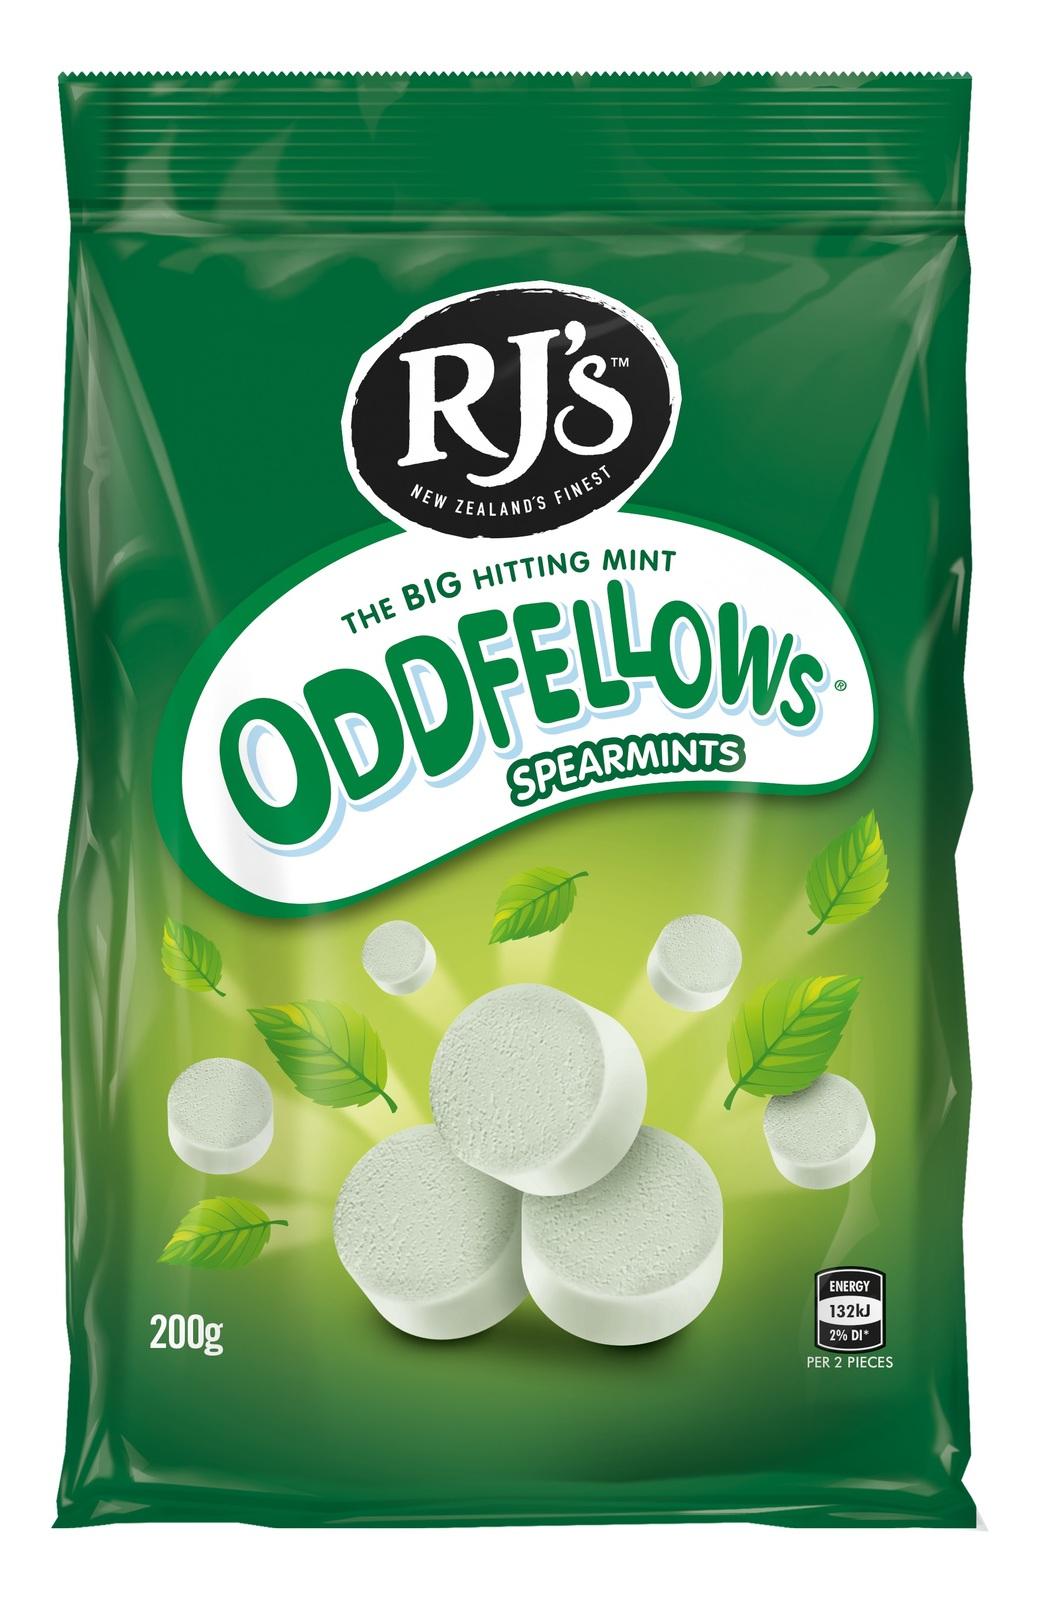 Oddfellows Spearmint (200g) image